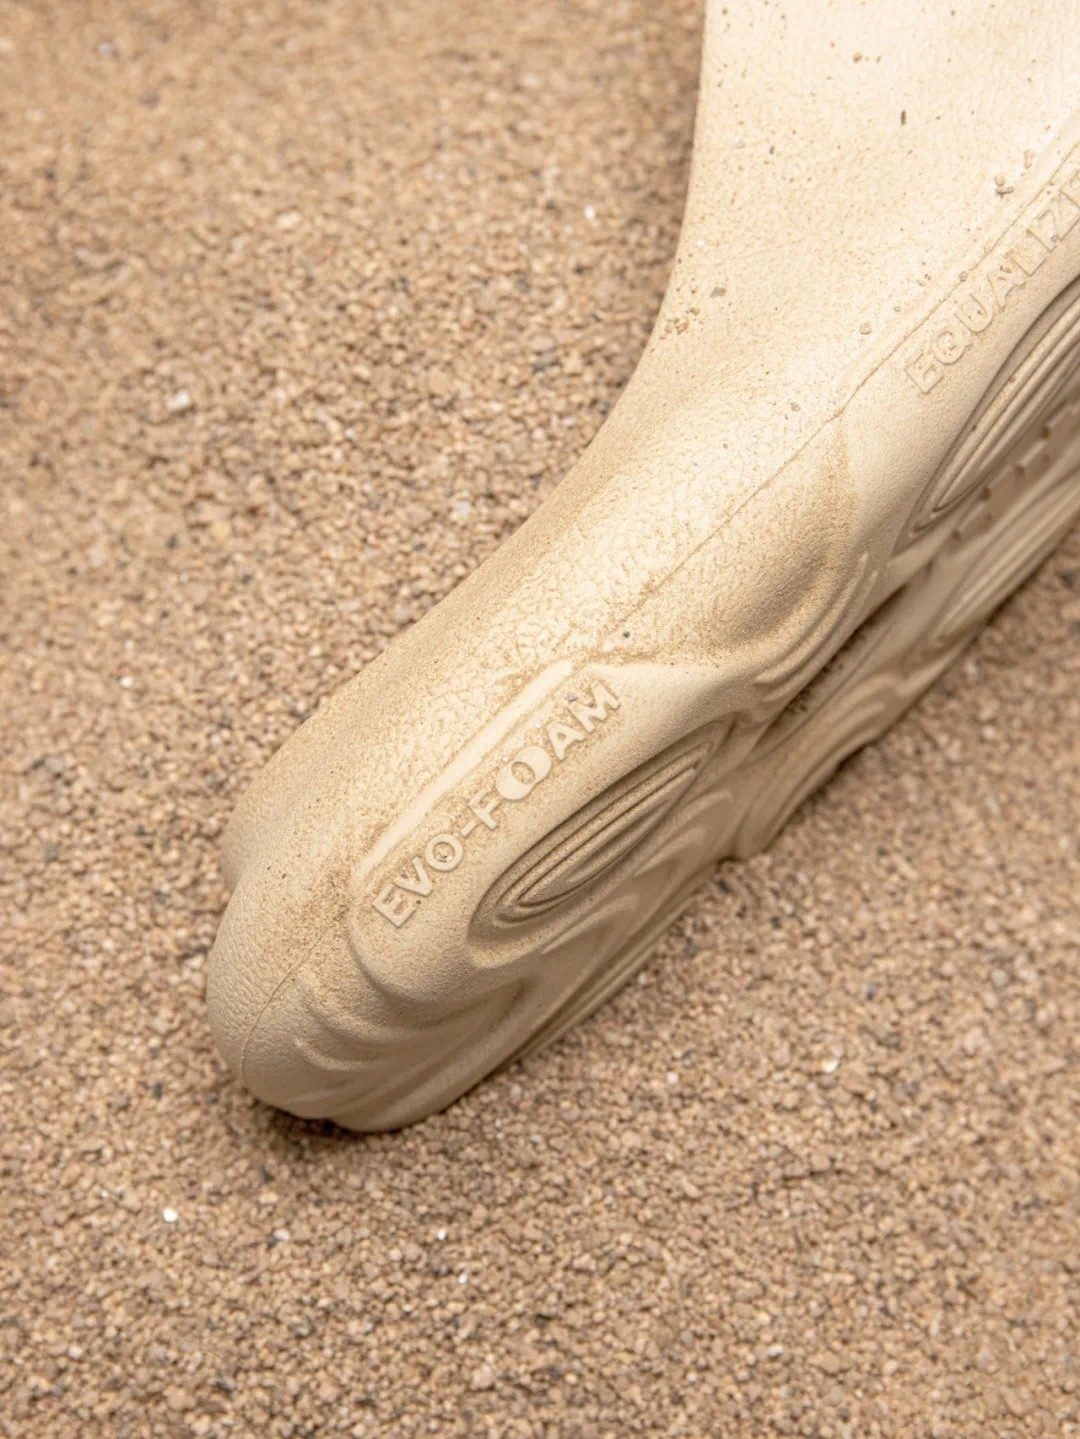 EQUALIZER,OASIS  迅速售罄!拖鞋颜值太高!四月初补货!